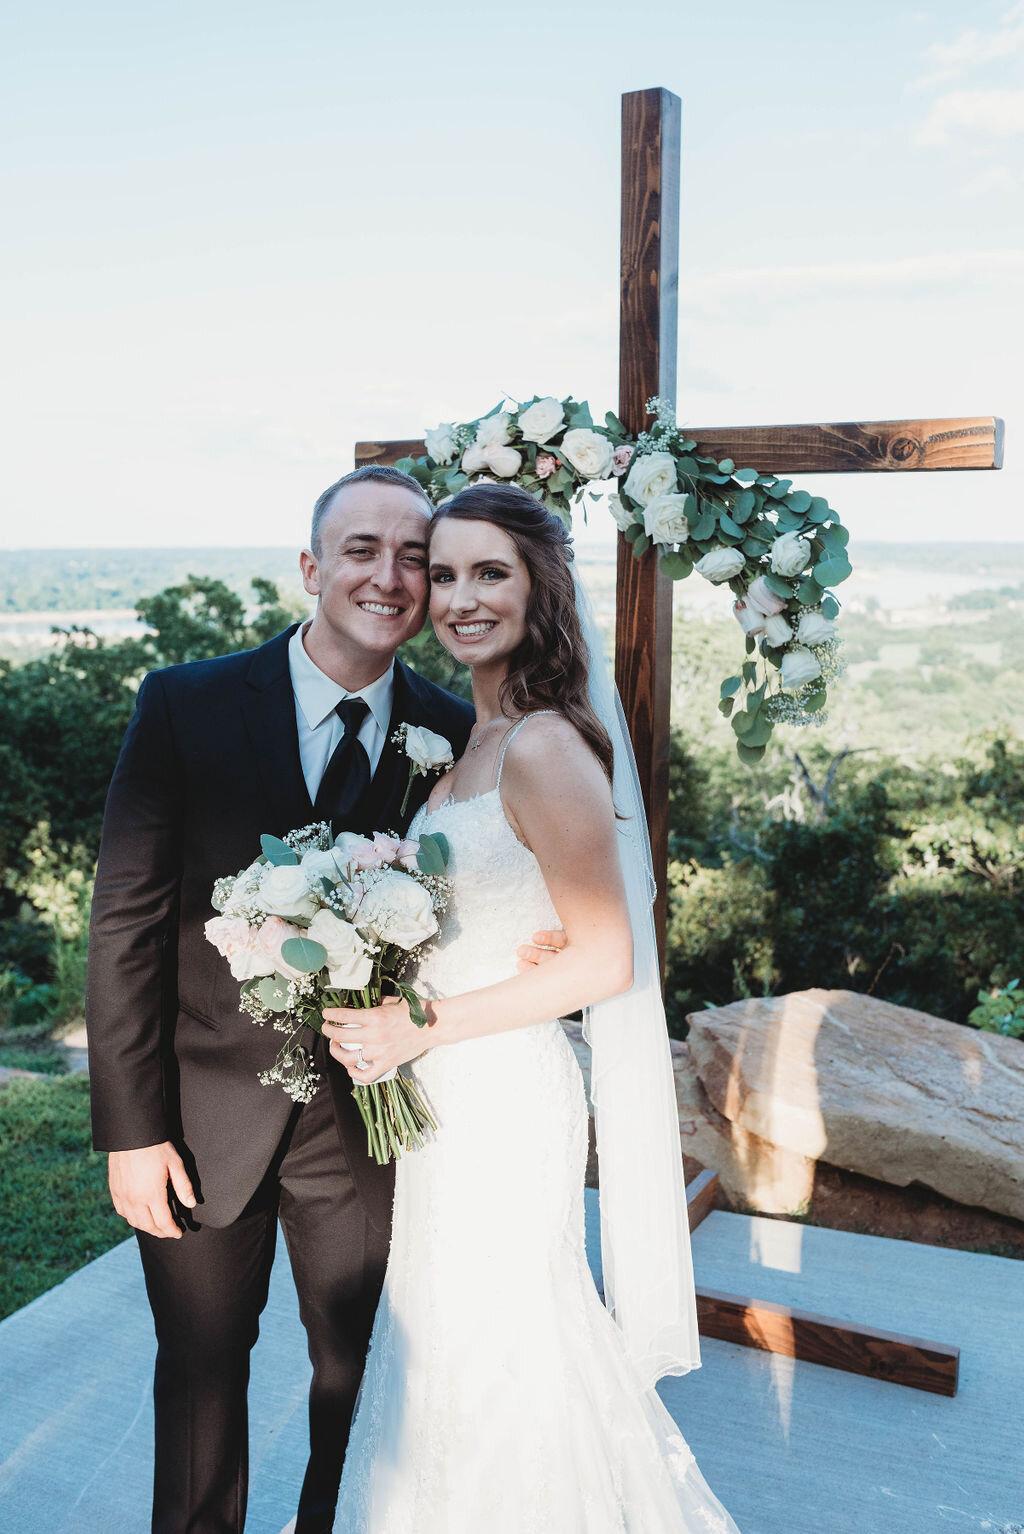 Tulsa Wedding Venue with a View 33.jpg